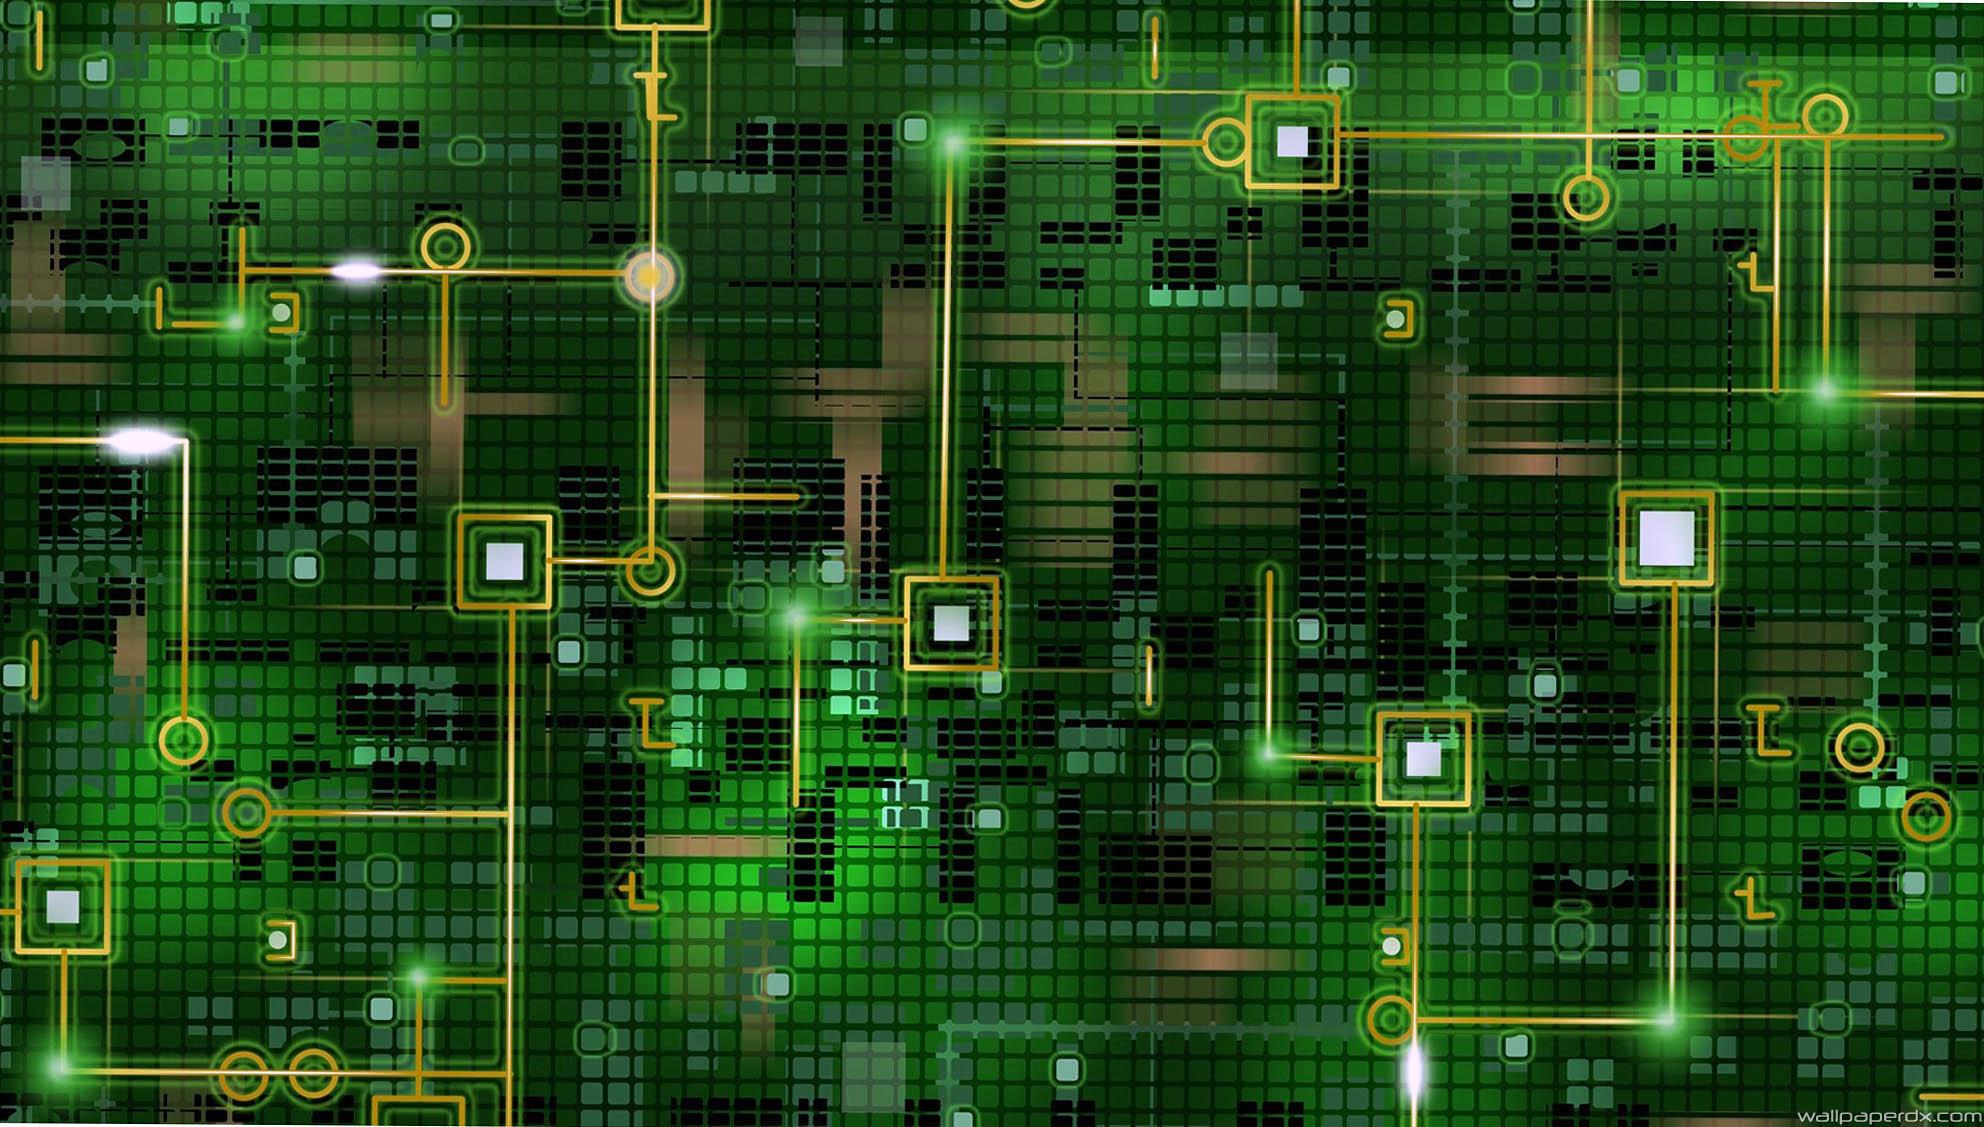 Futuristic Iphone X Wallpaper Computer Chip Wallpaper 57 Images